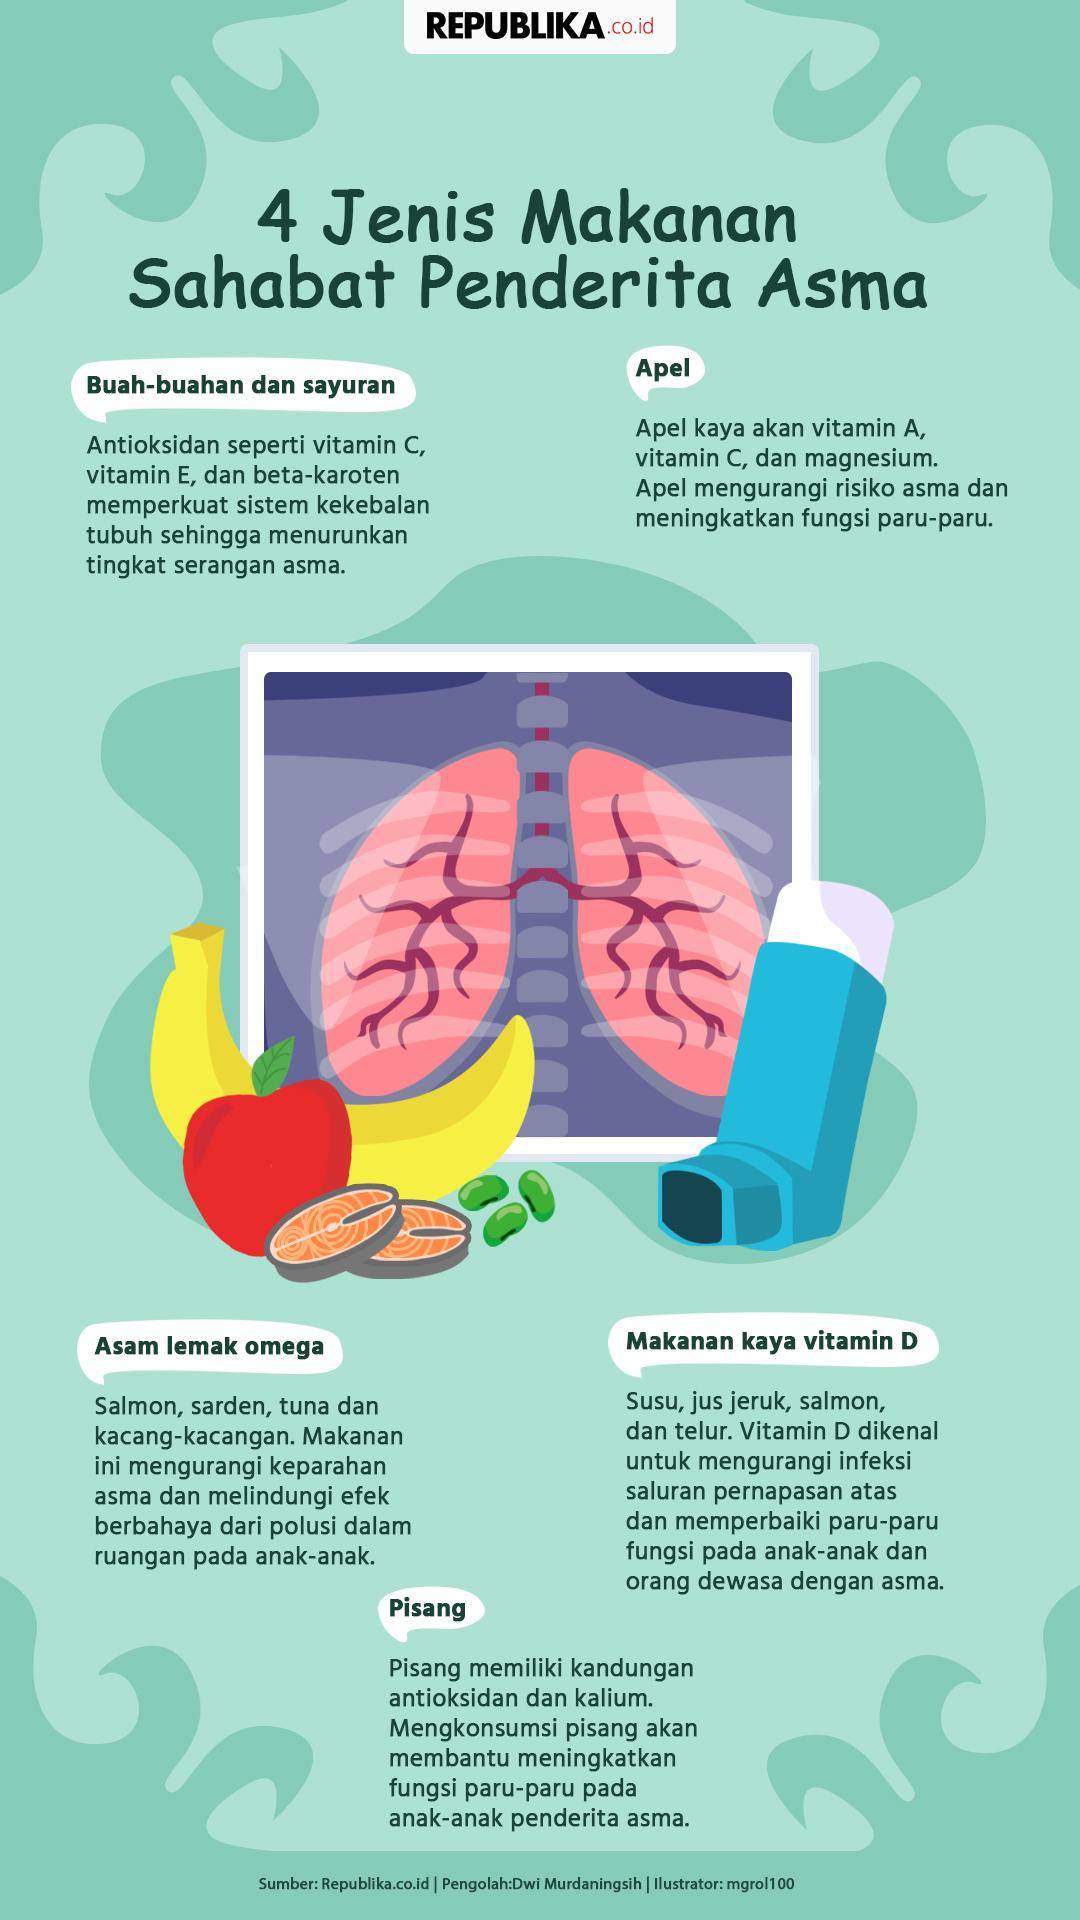 4 Jenis Makanan Sahabat Penderita Asma Republika Online